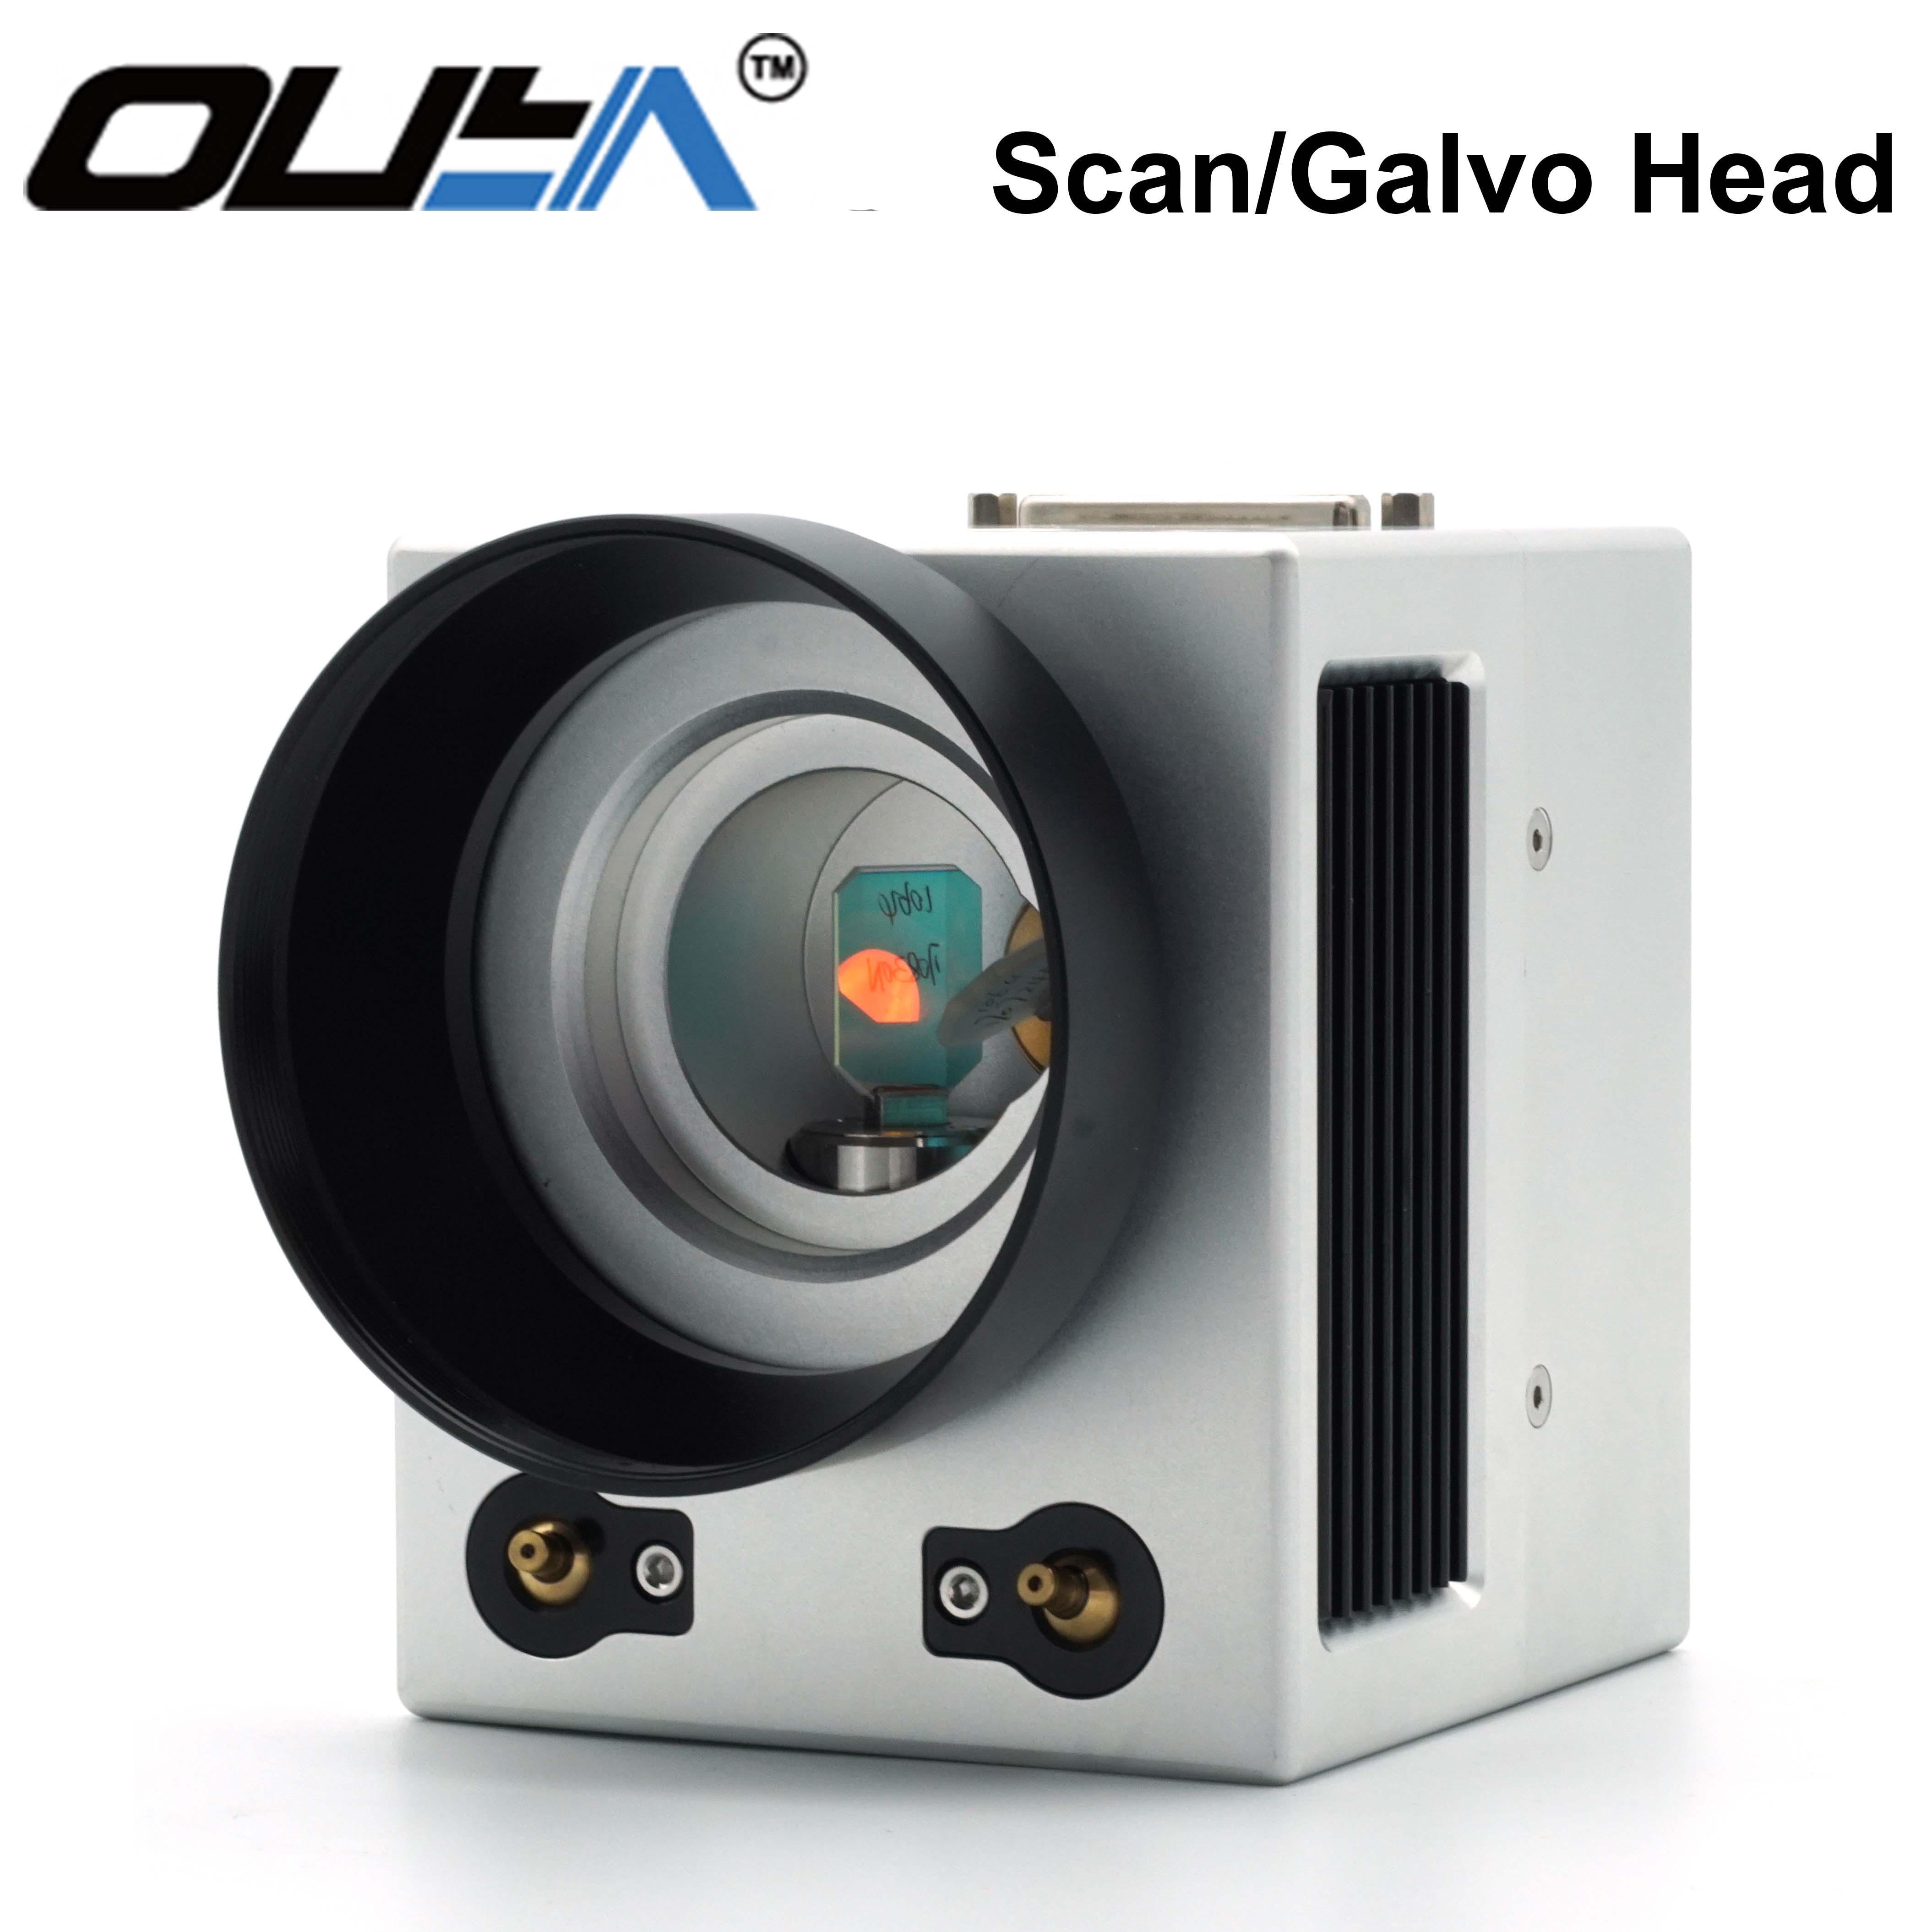 FREE SHIPPING OUYA Galvo Head Double Infrared Auxiliary Focusing Galvo Head 1064 Nm FIber Laser Scan Head  SCANhead 10